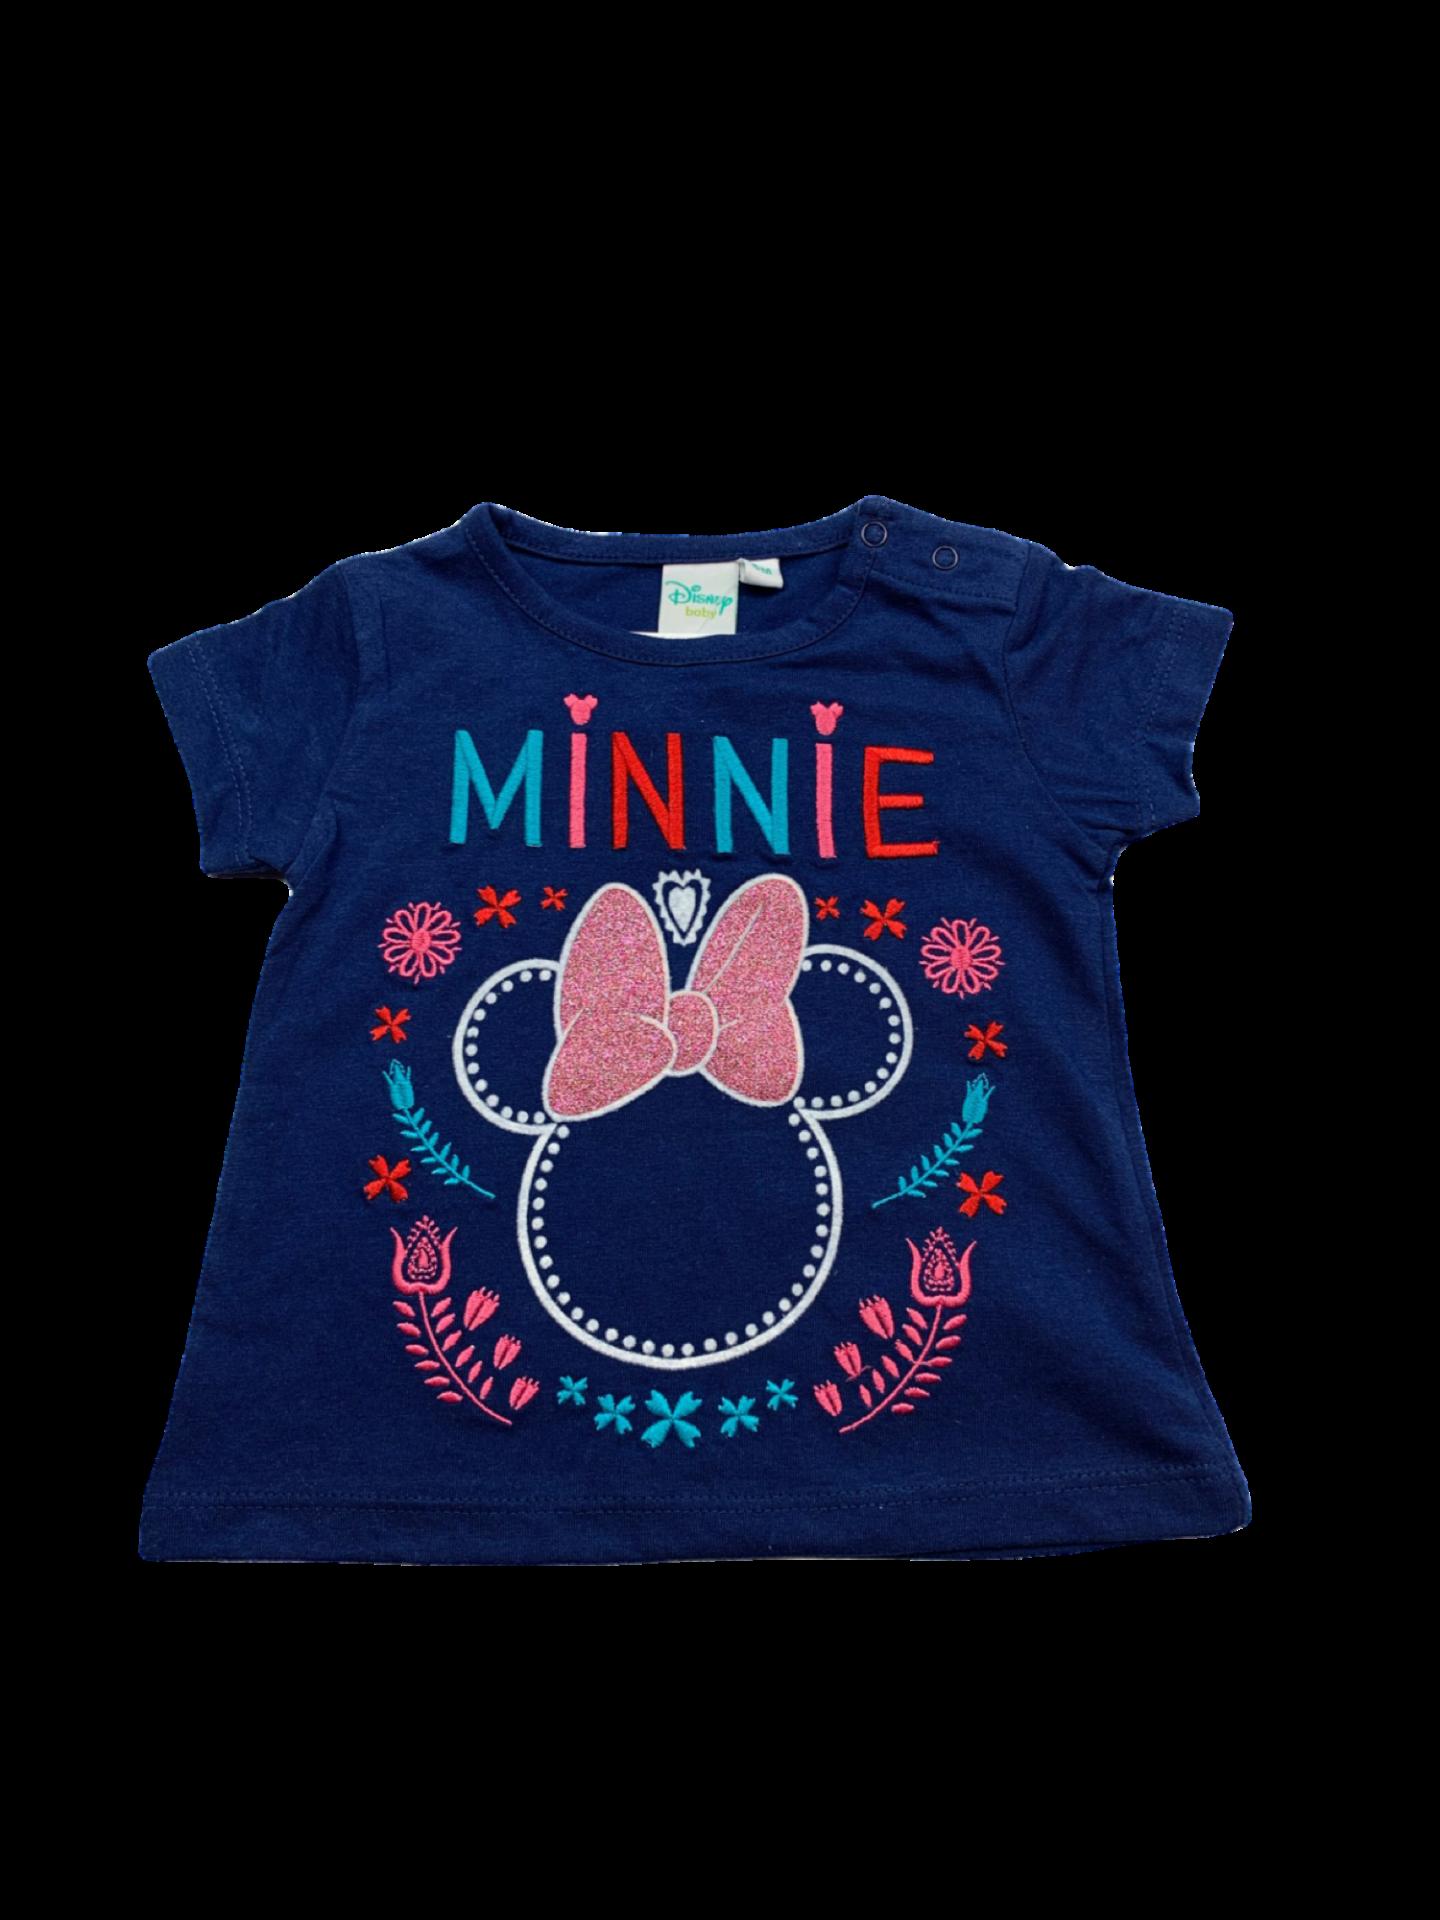 Camiseta de niña marino Minnie